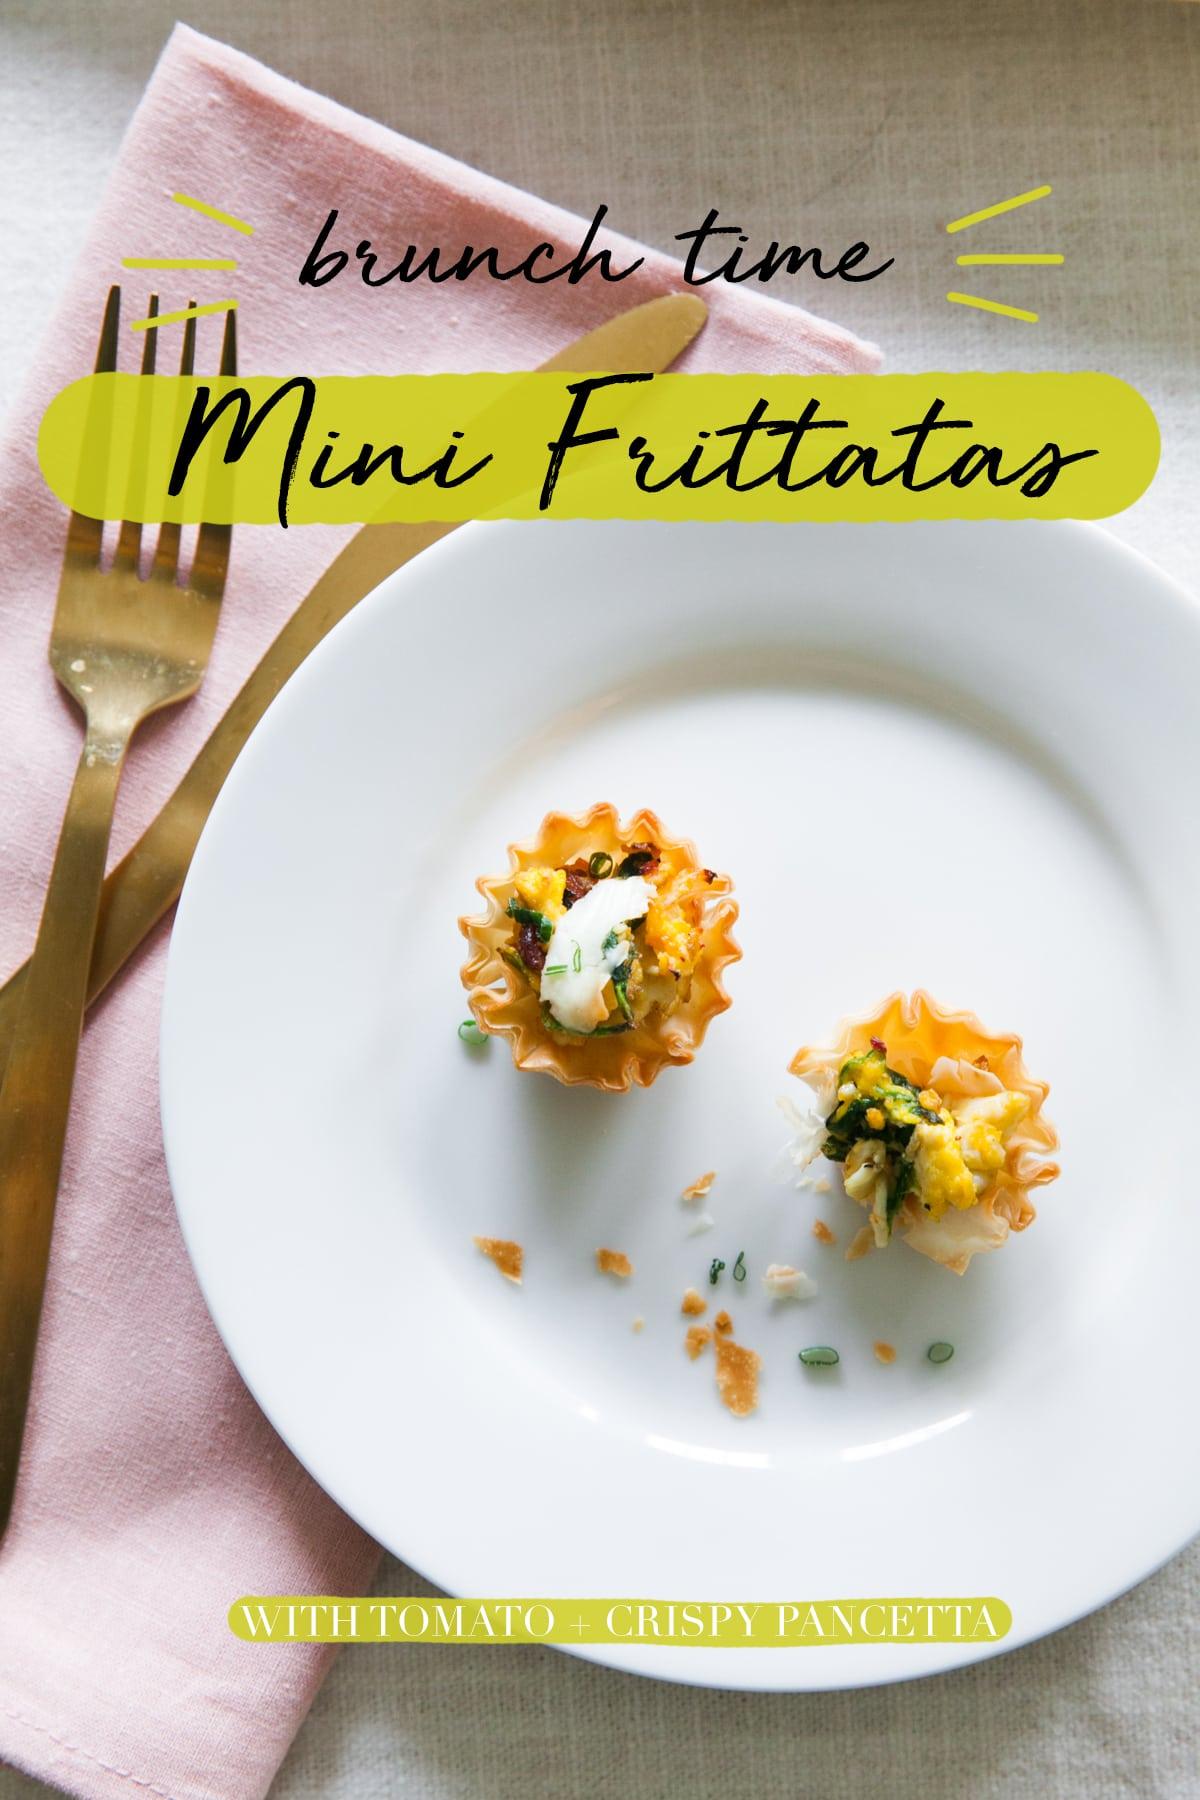 Brunch Time! | Mini Frittatas with Tomato + Crispy Pancetta | Quick Brunch Recipes | Amuse Bouche Breakfast Foods | Jessica Brigham Magazine for Life